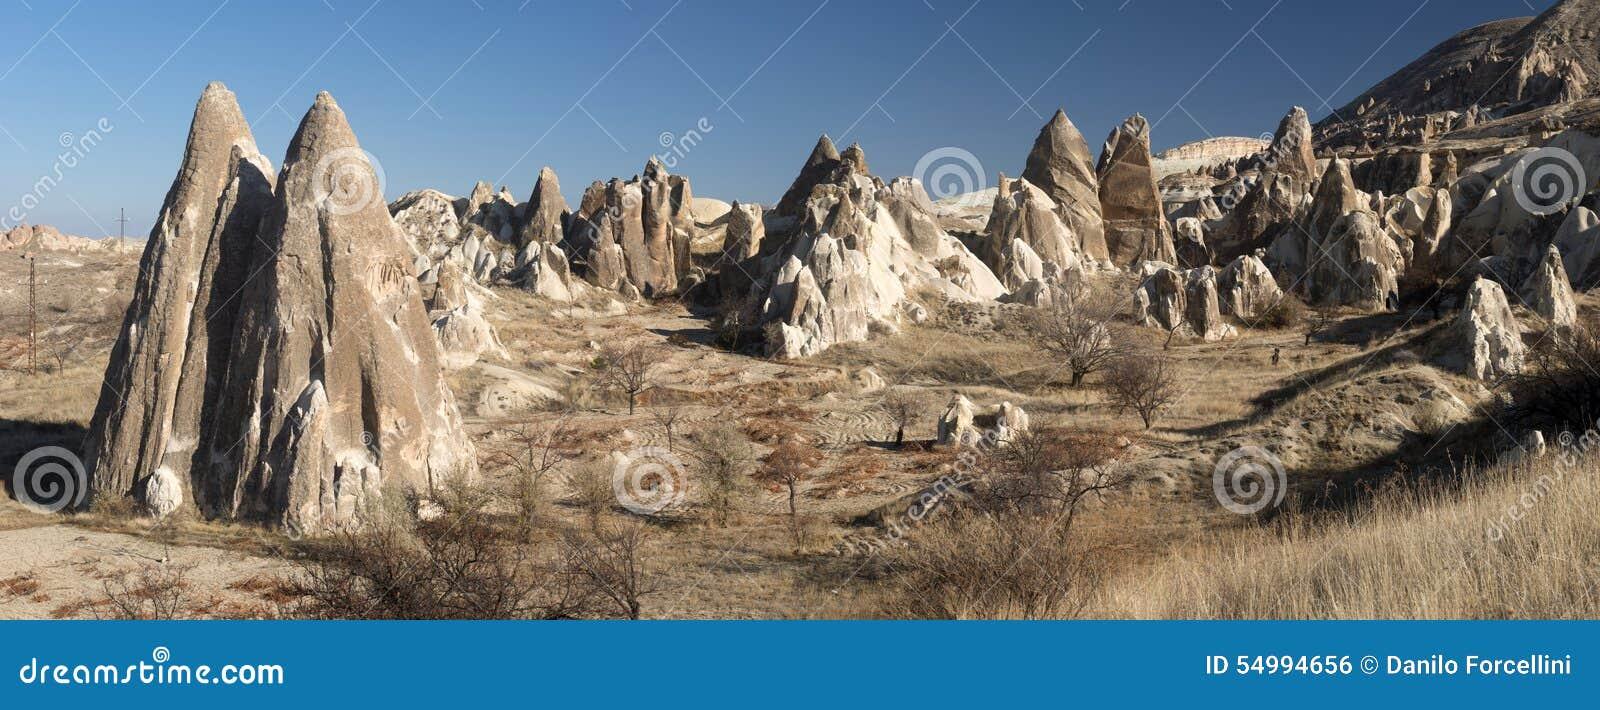 Liefdevallei, Goreme-gebied, Turkije